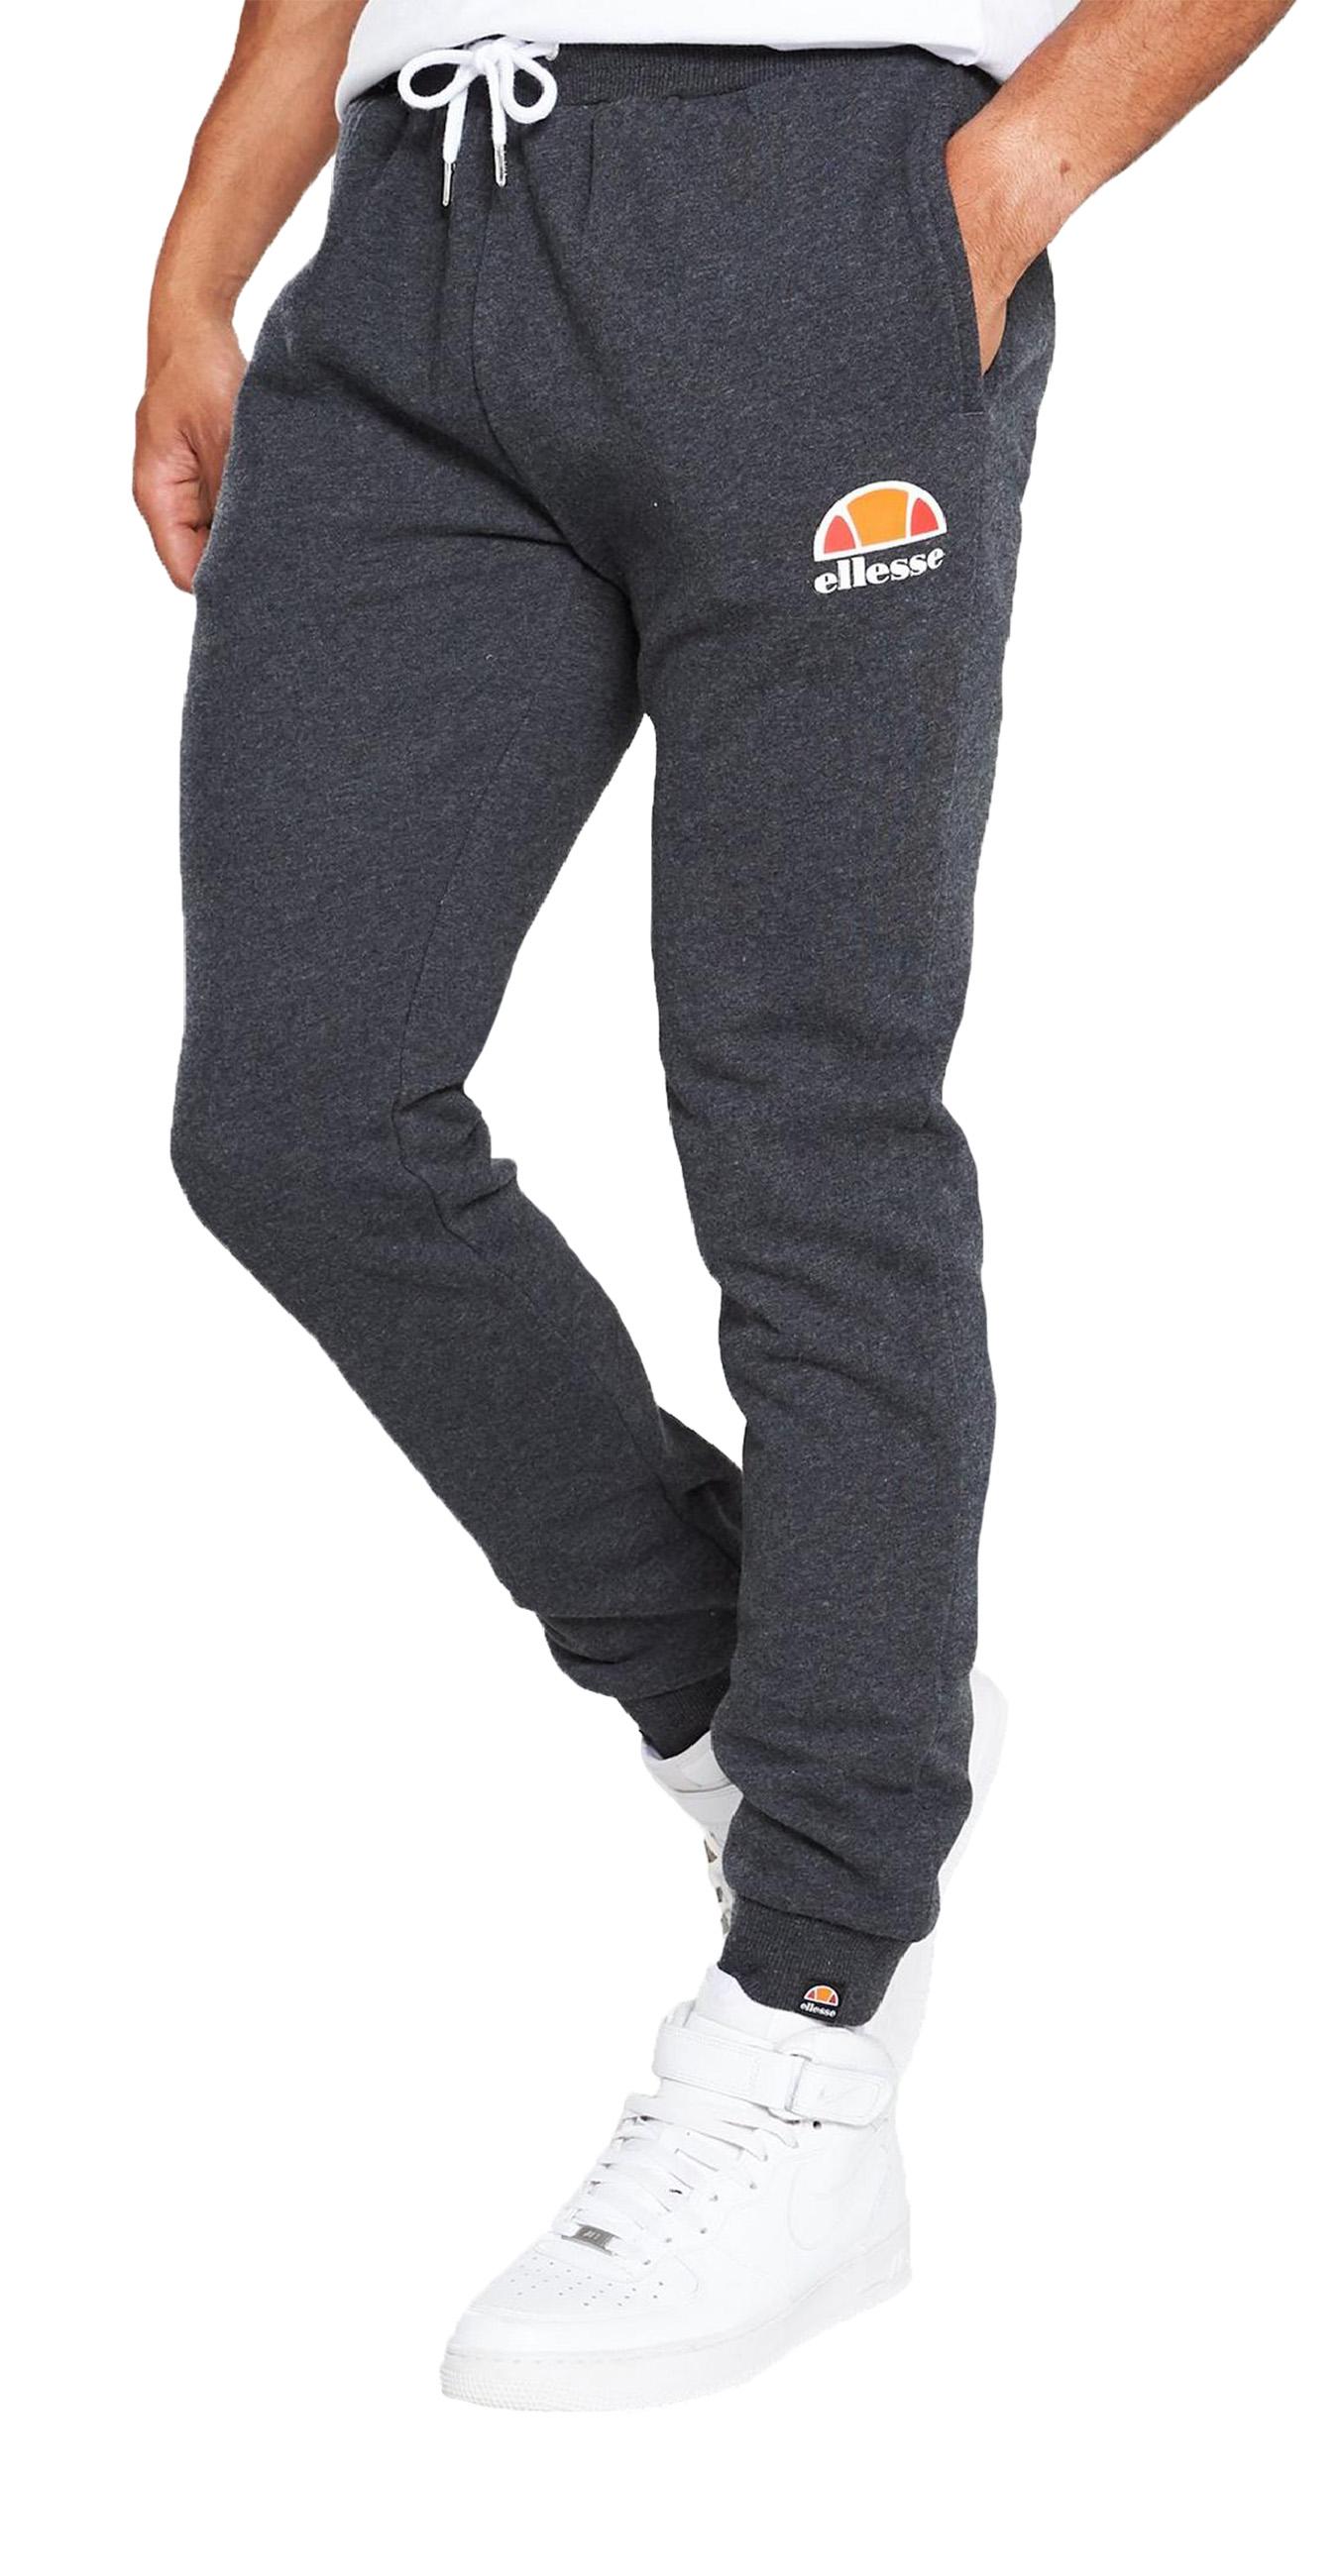 Detalles de Ellesse Hombre Ovest Jogging Fondos Sudor Correr Pantalones Gris Oscuro